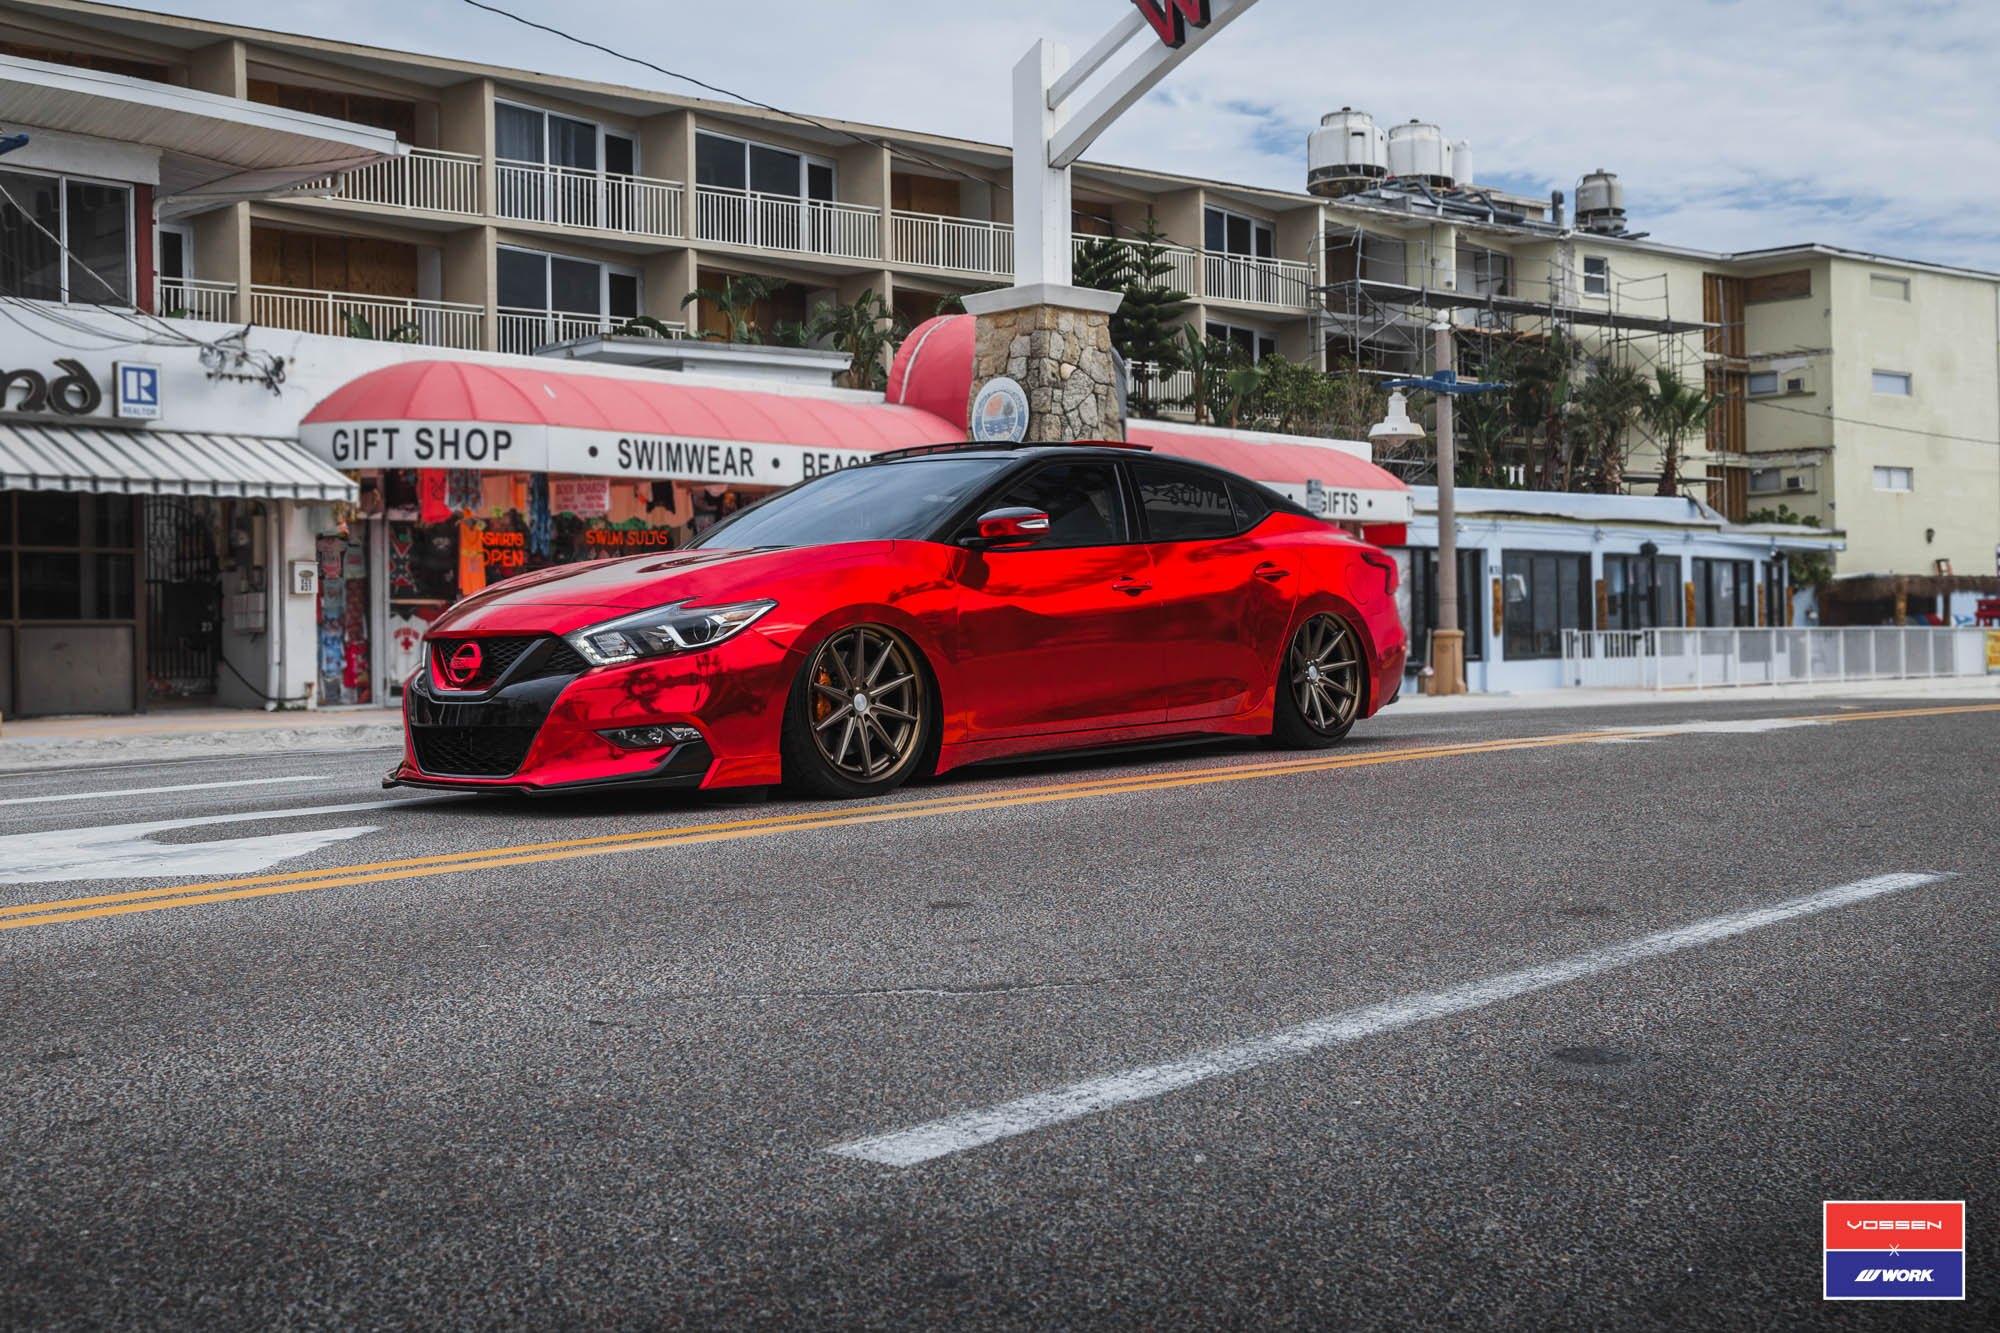 2016 Nissan Maxima Slammed >> Slammed Nissan Maxima With a Chrome Red Wrap and Vossen Rims — CARiD.com Gallery